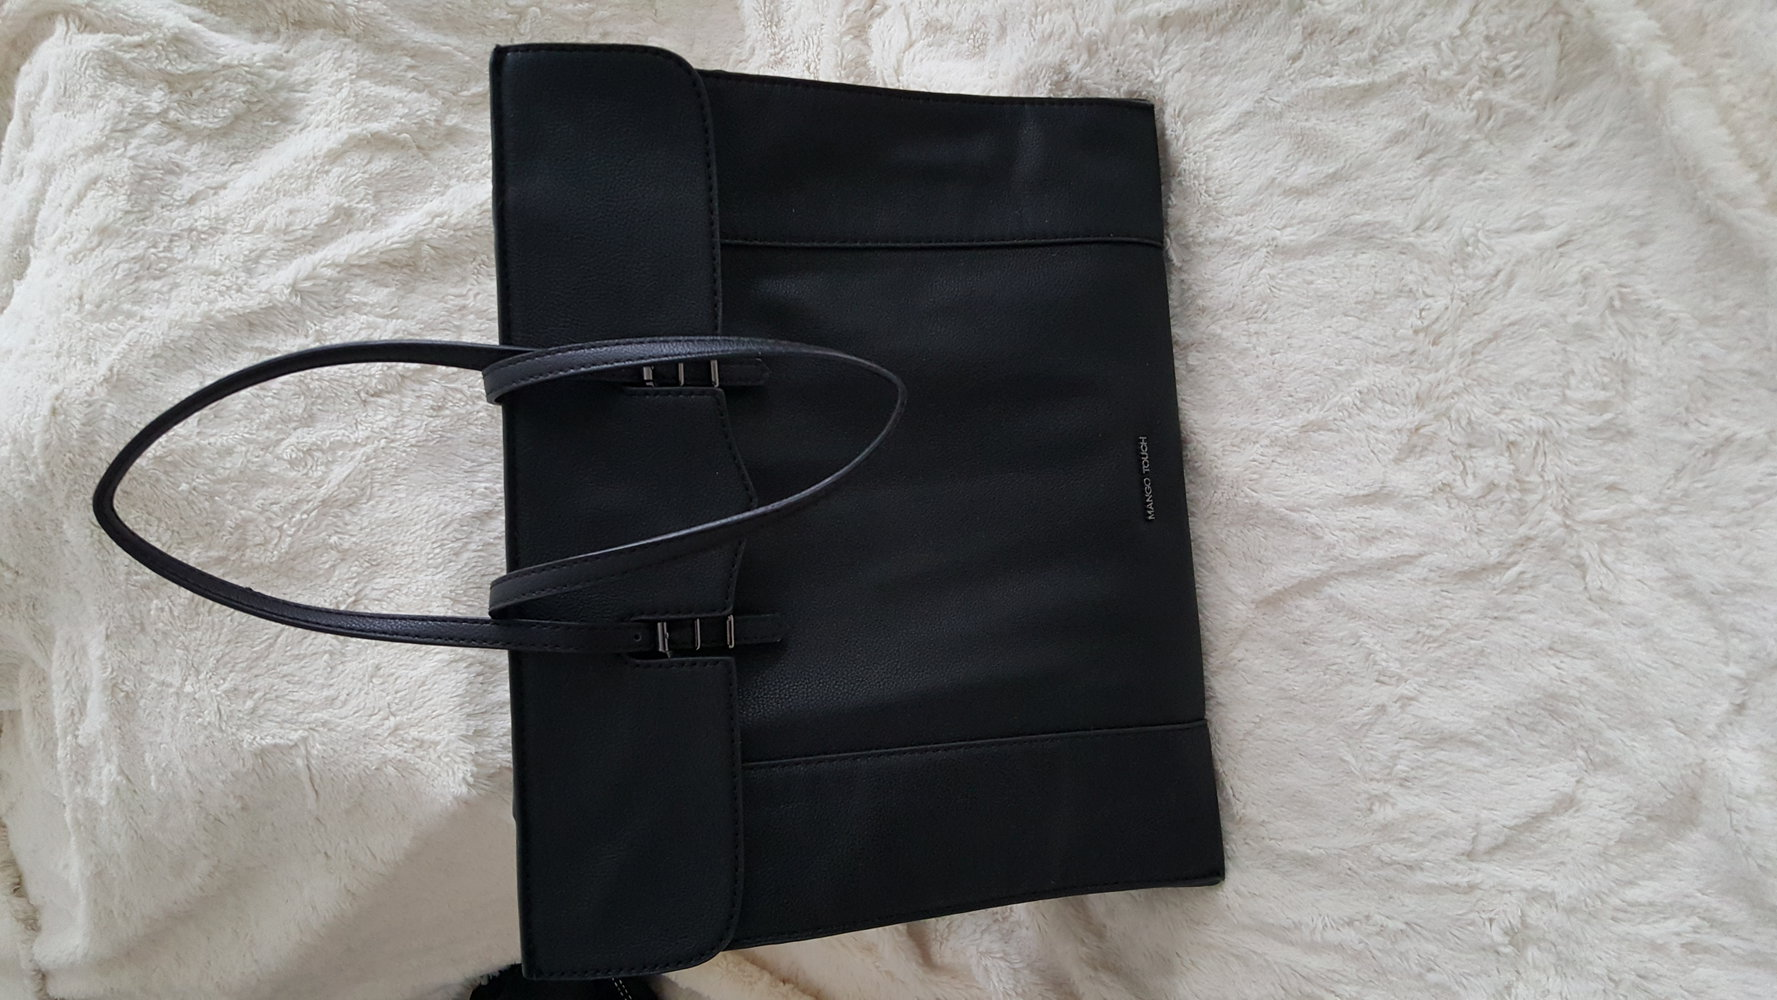 gro e schwarze tasche. Black Bedroom Furniture Sets. Home Design Ideas